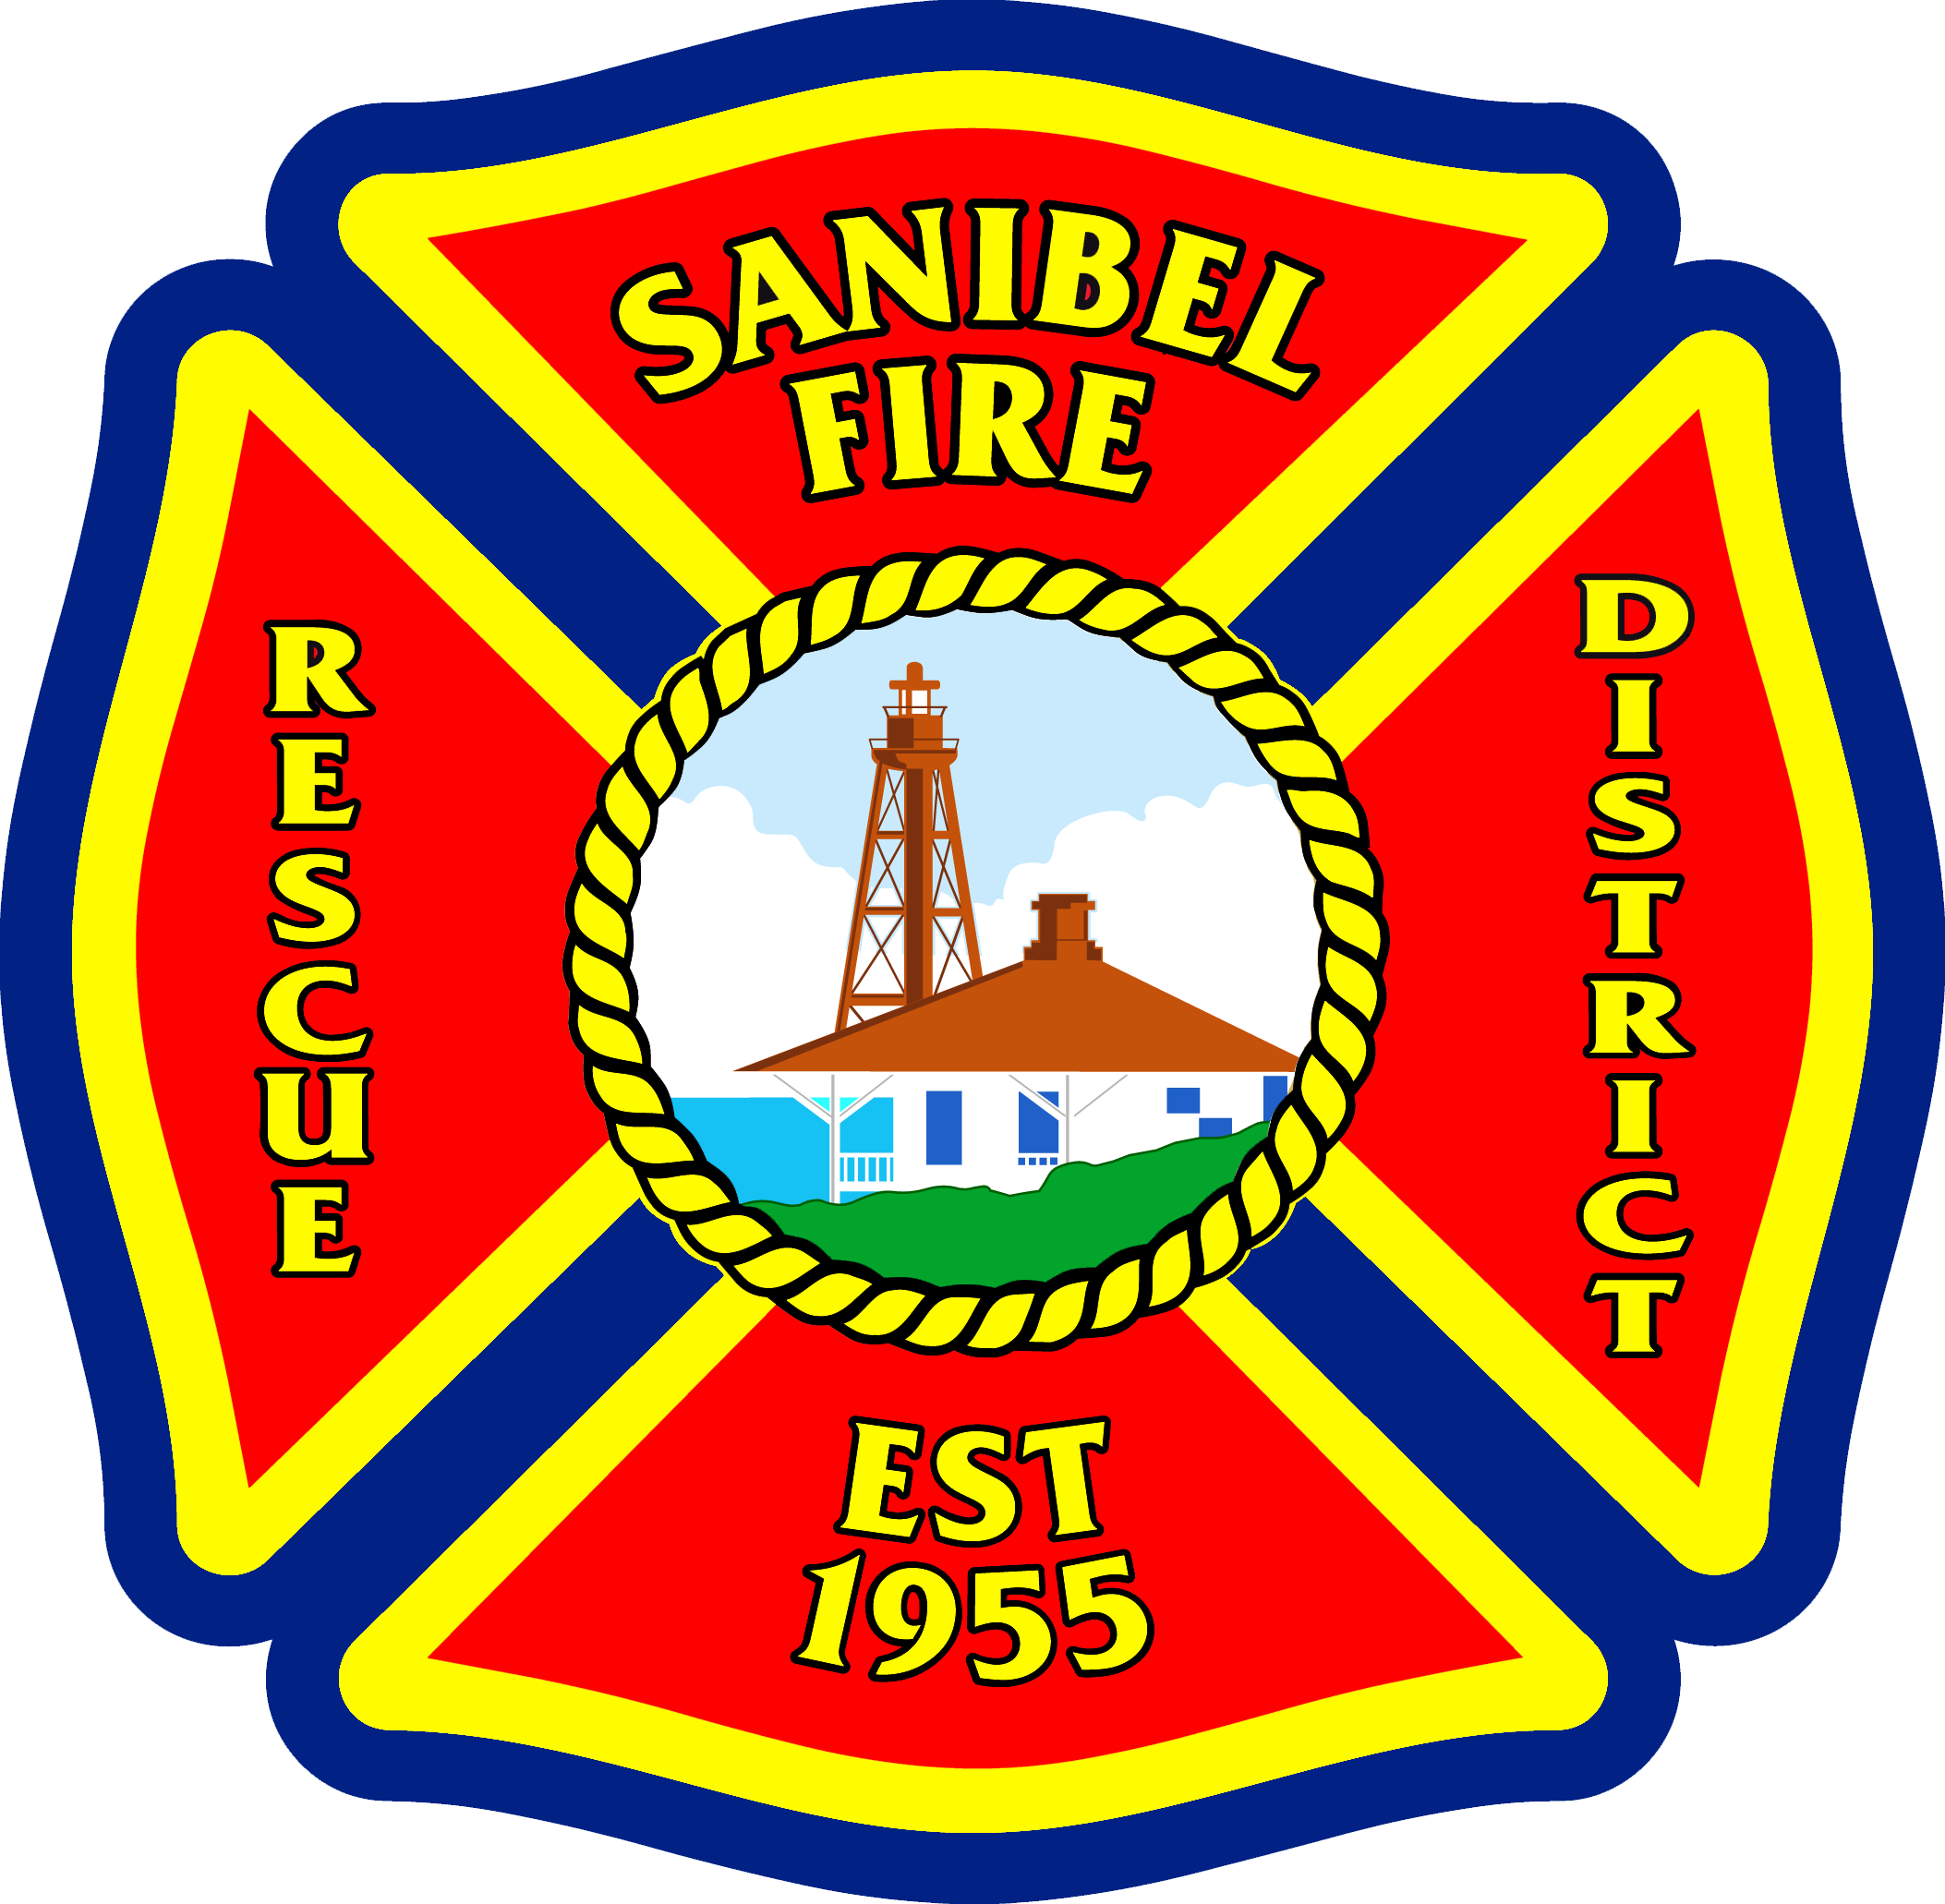 Fireman clipart badge. Sanibel fire rescue heraldy